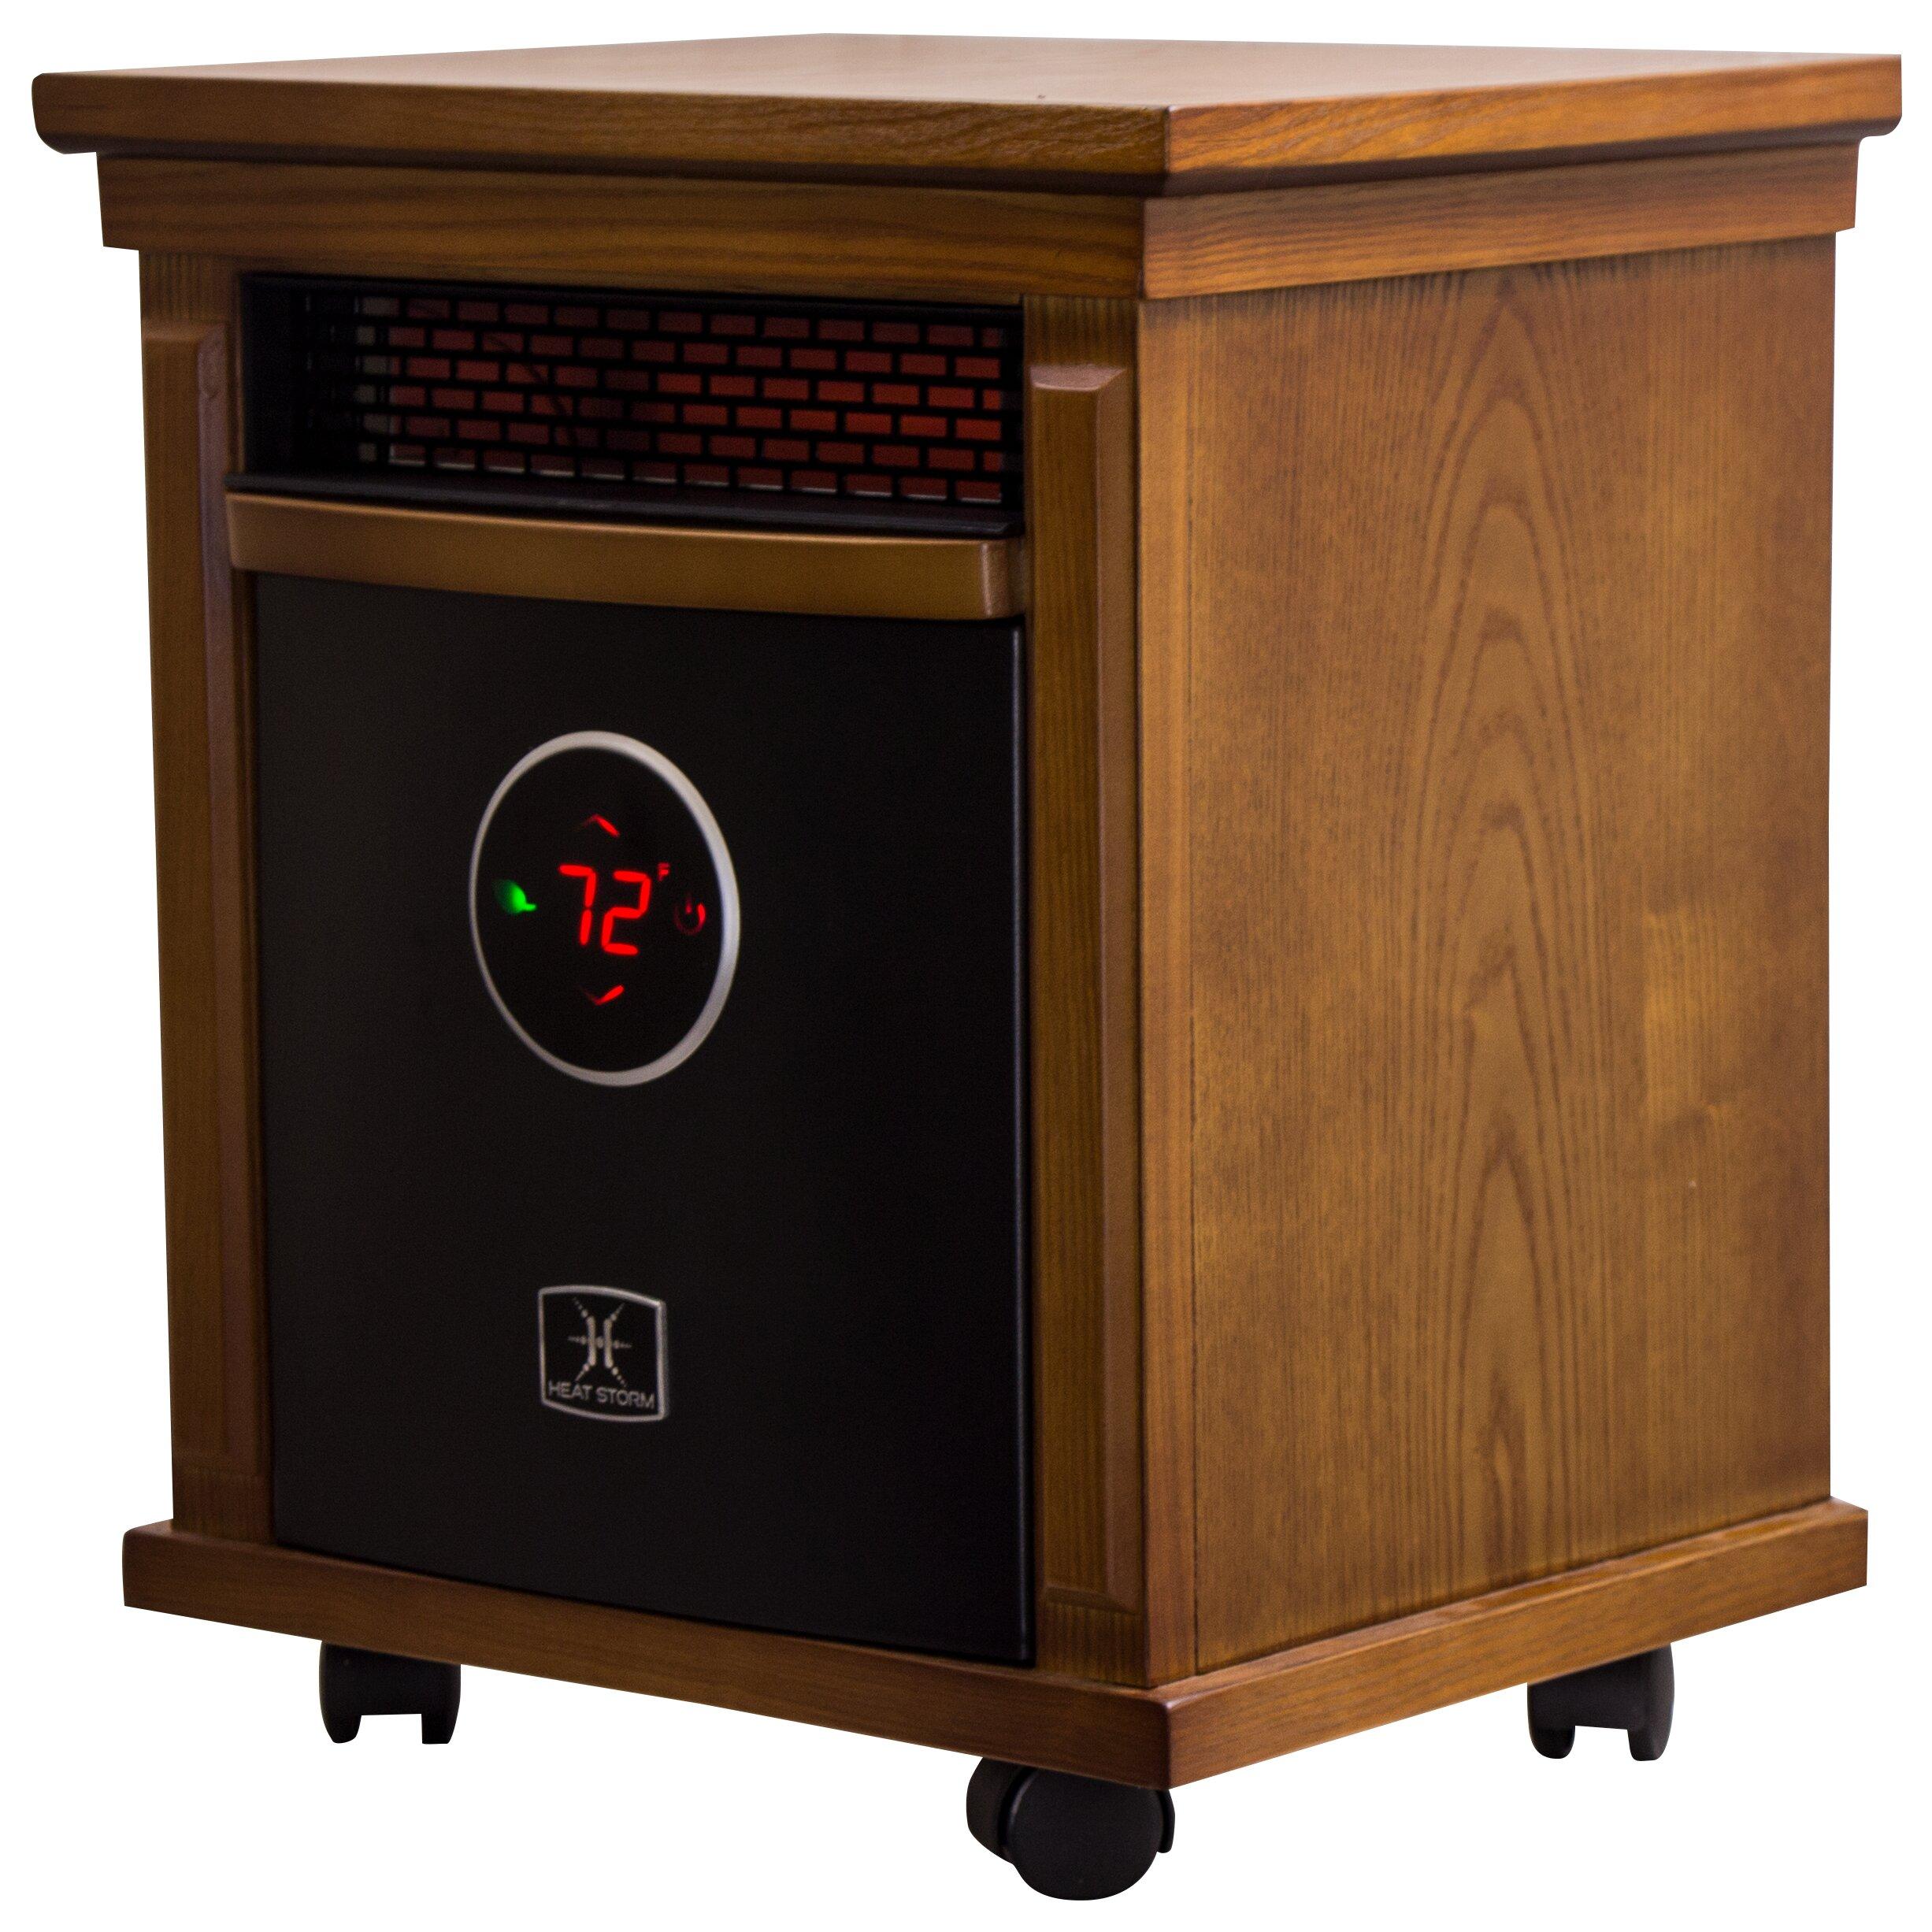 Storm Smithfield 1,500 Watt Portable Electric Infrared Cabinet Heater